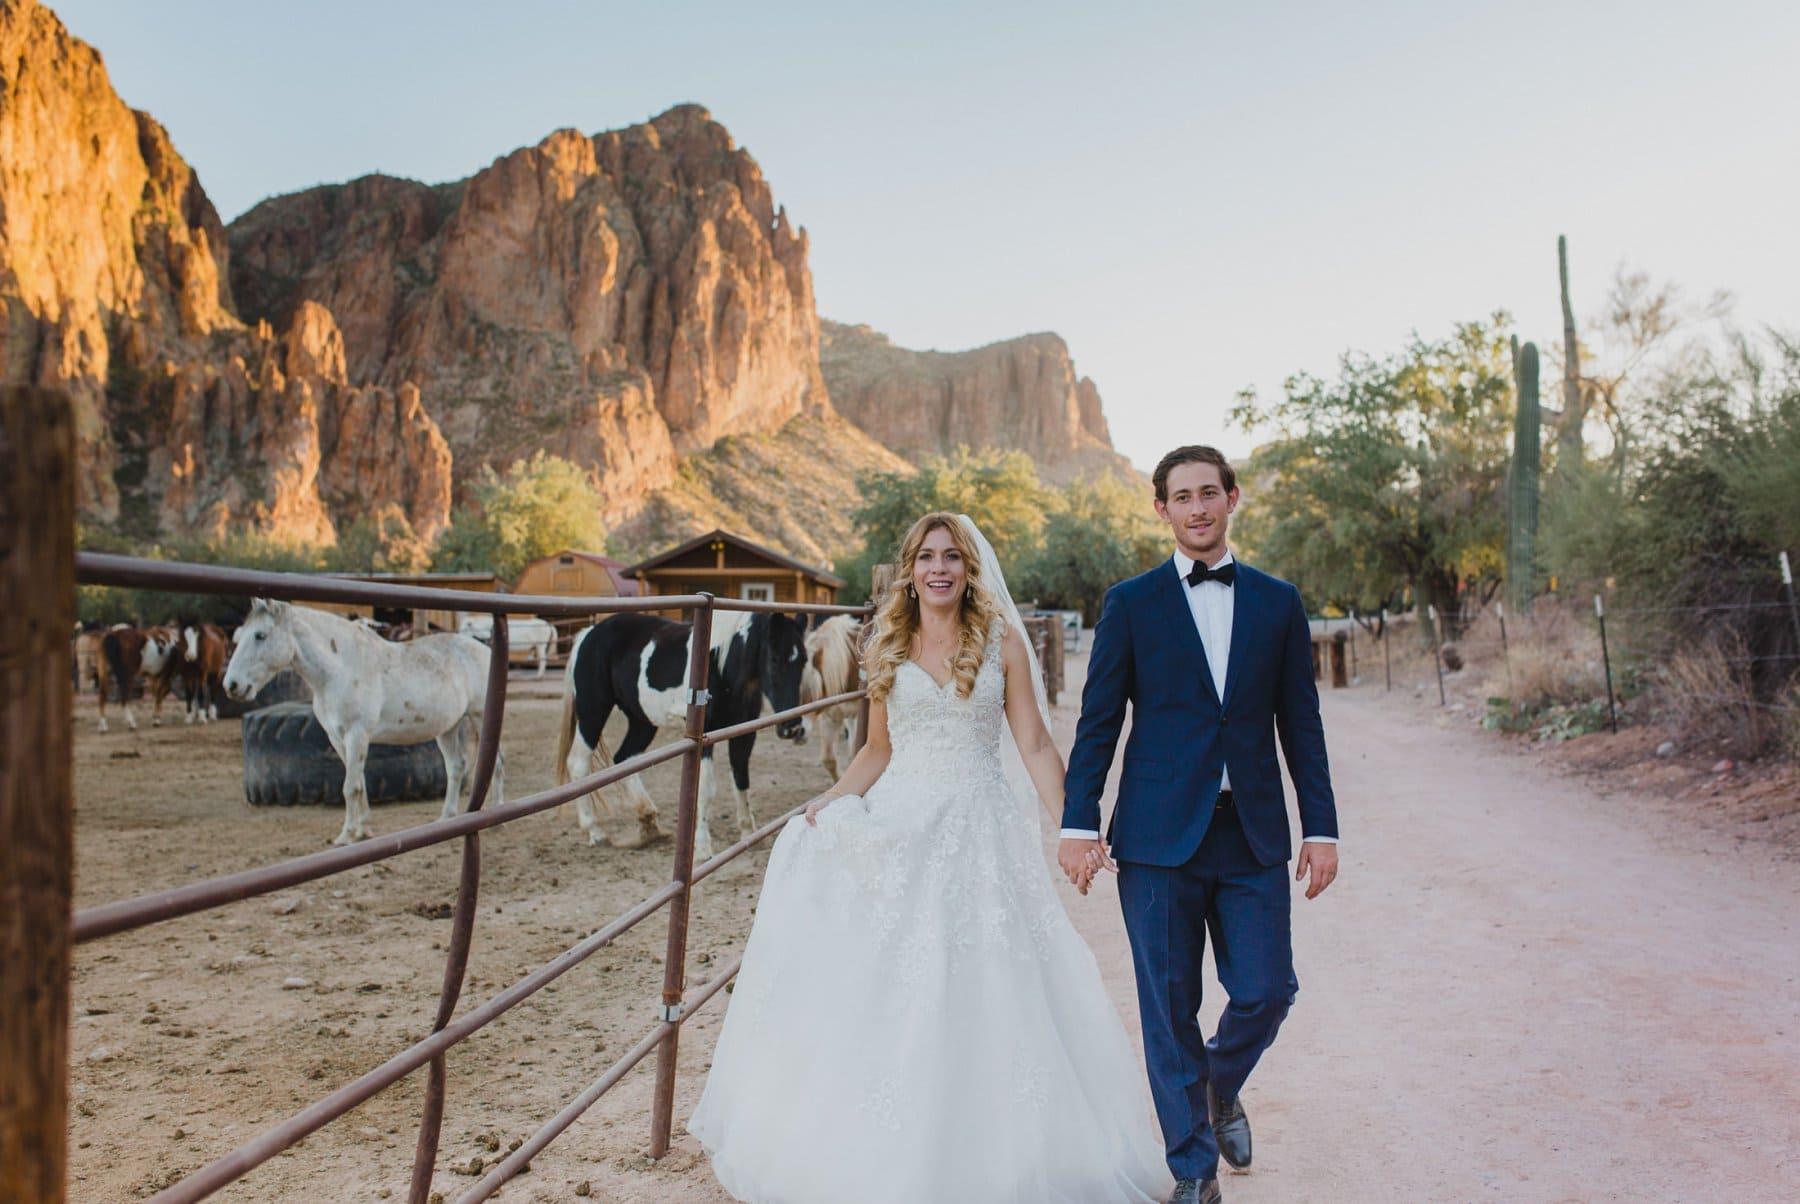 Saguaro Lake Ranch wedding with horses